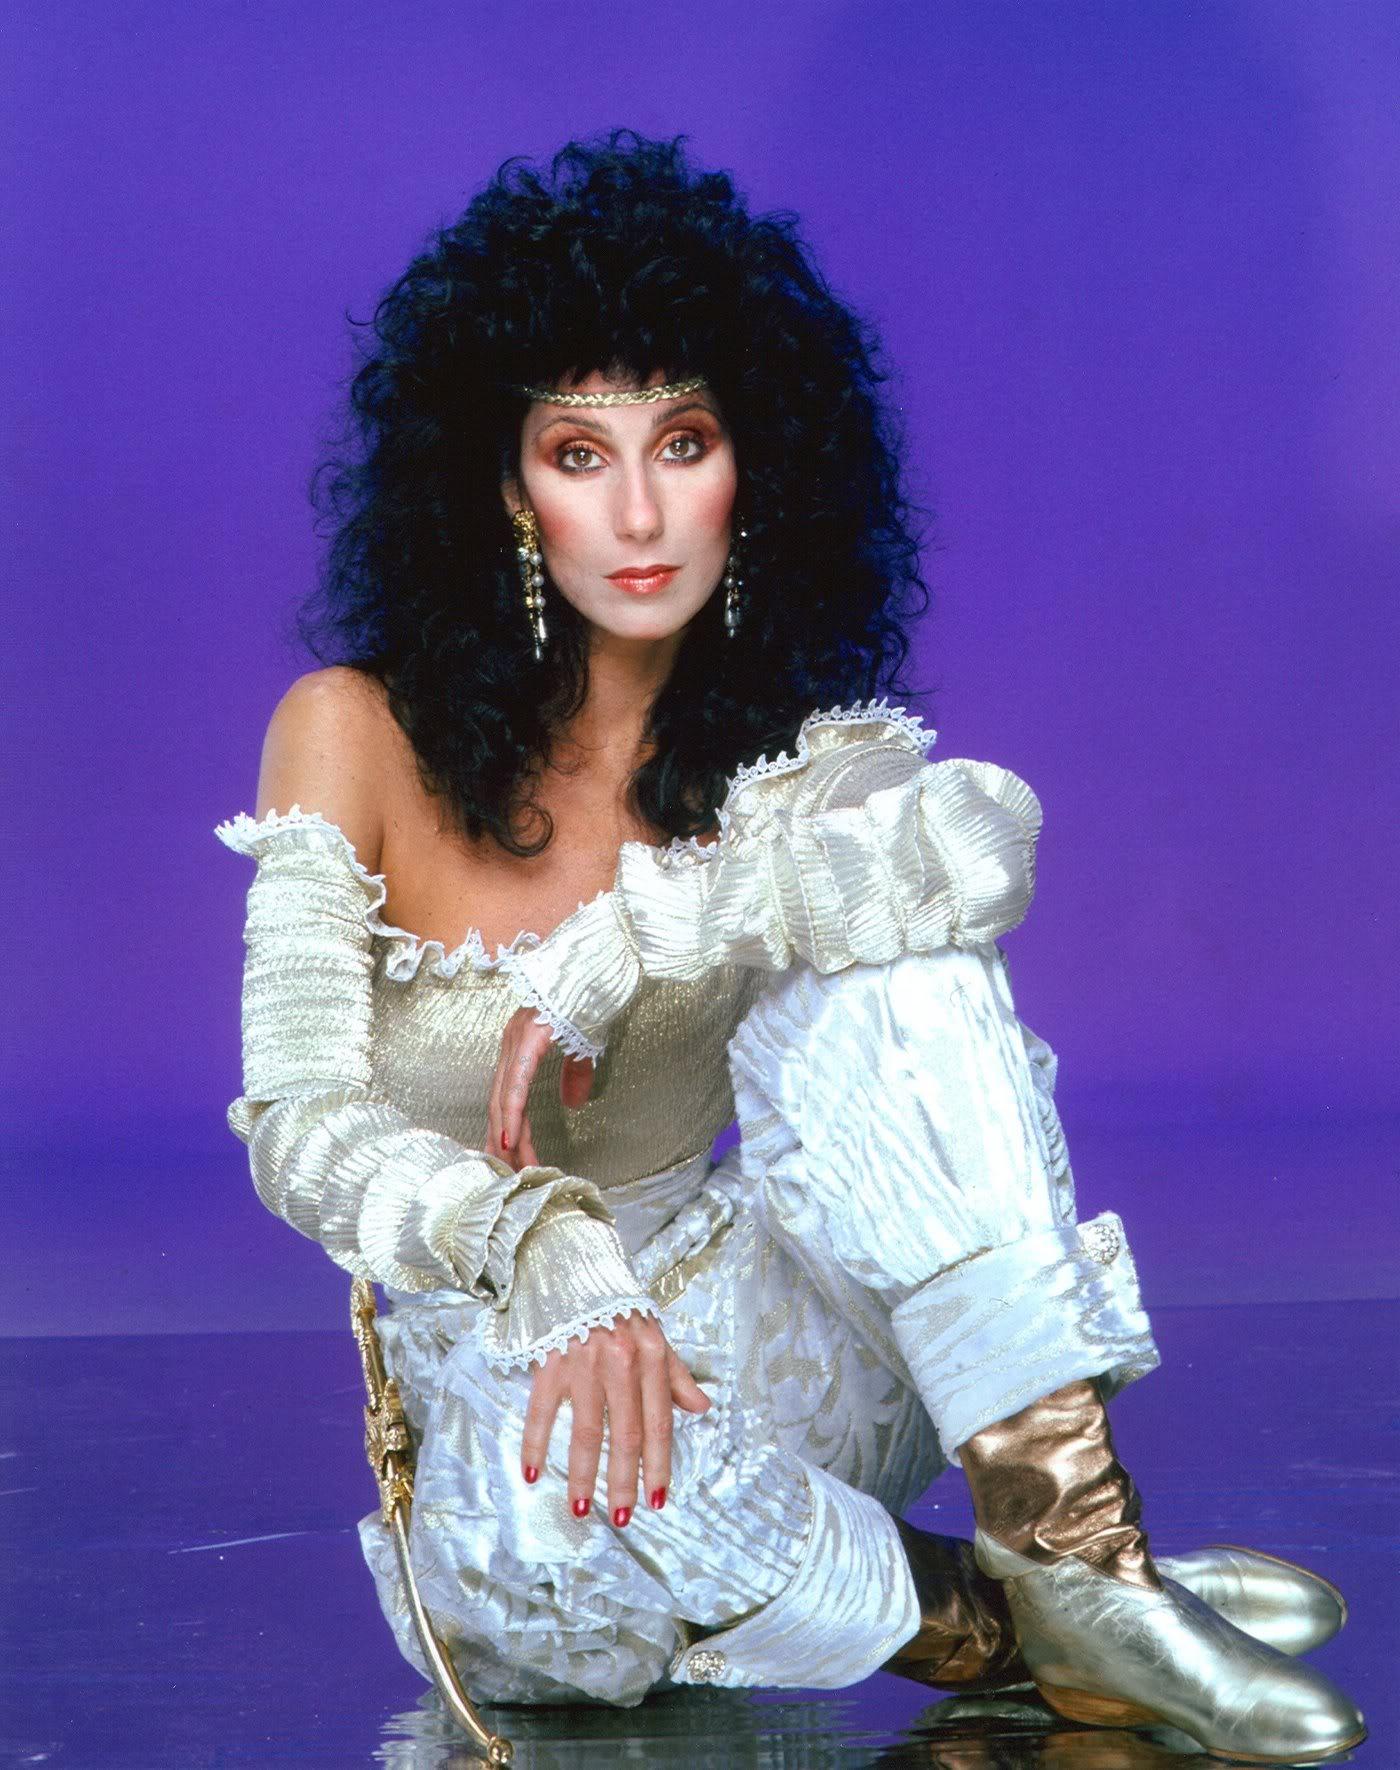 Cher1001